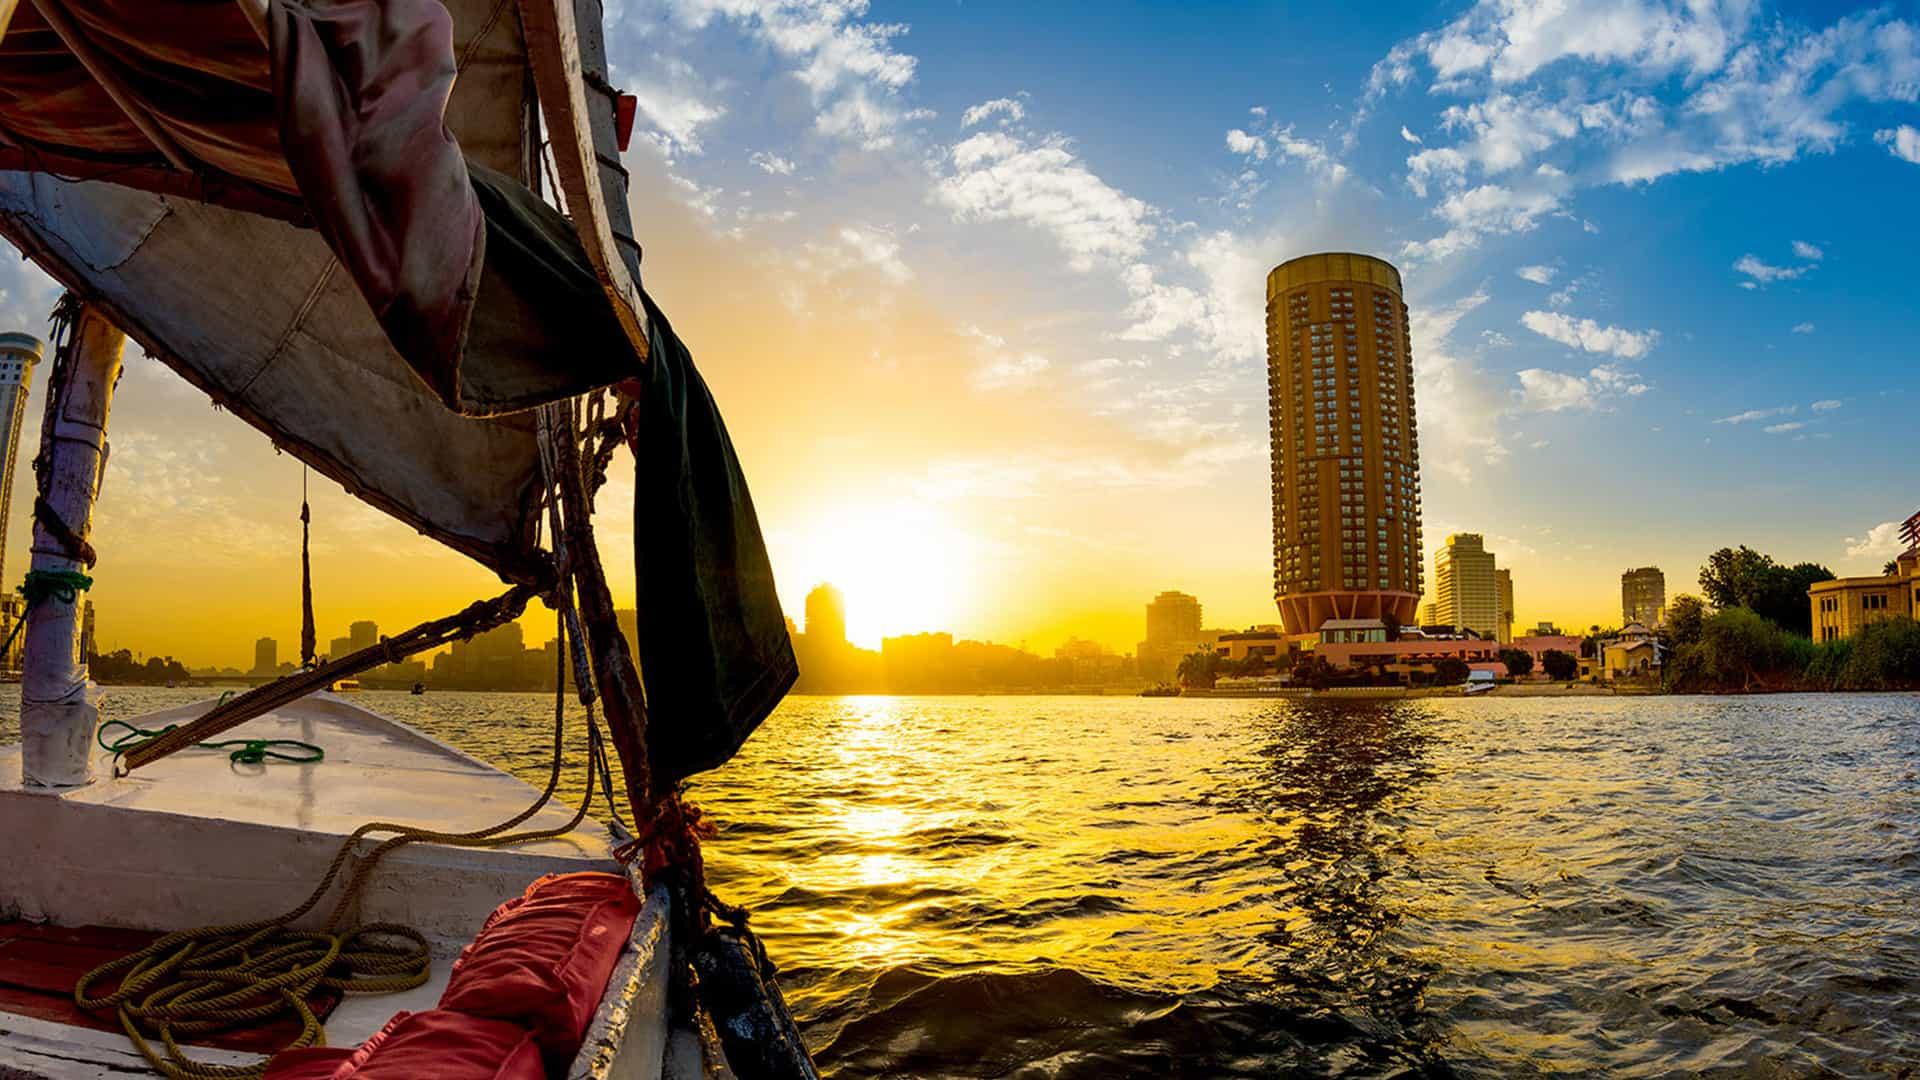 Nile Felucca Cairo Egypt